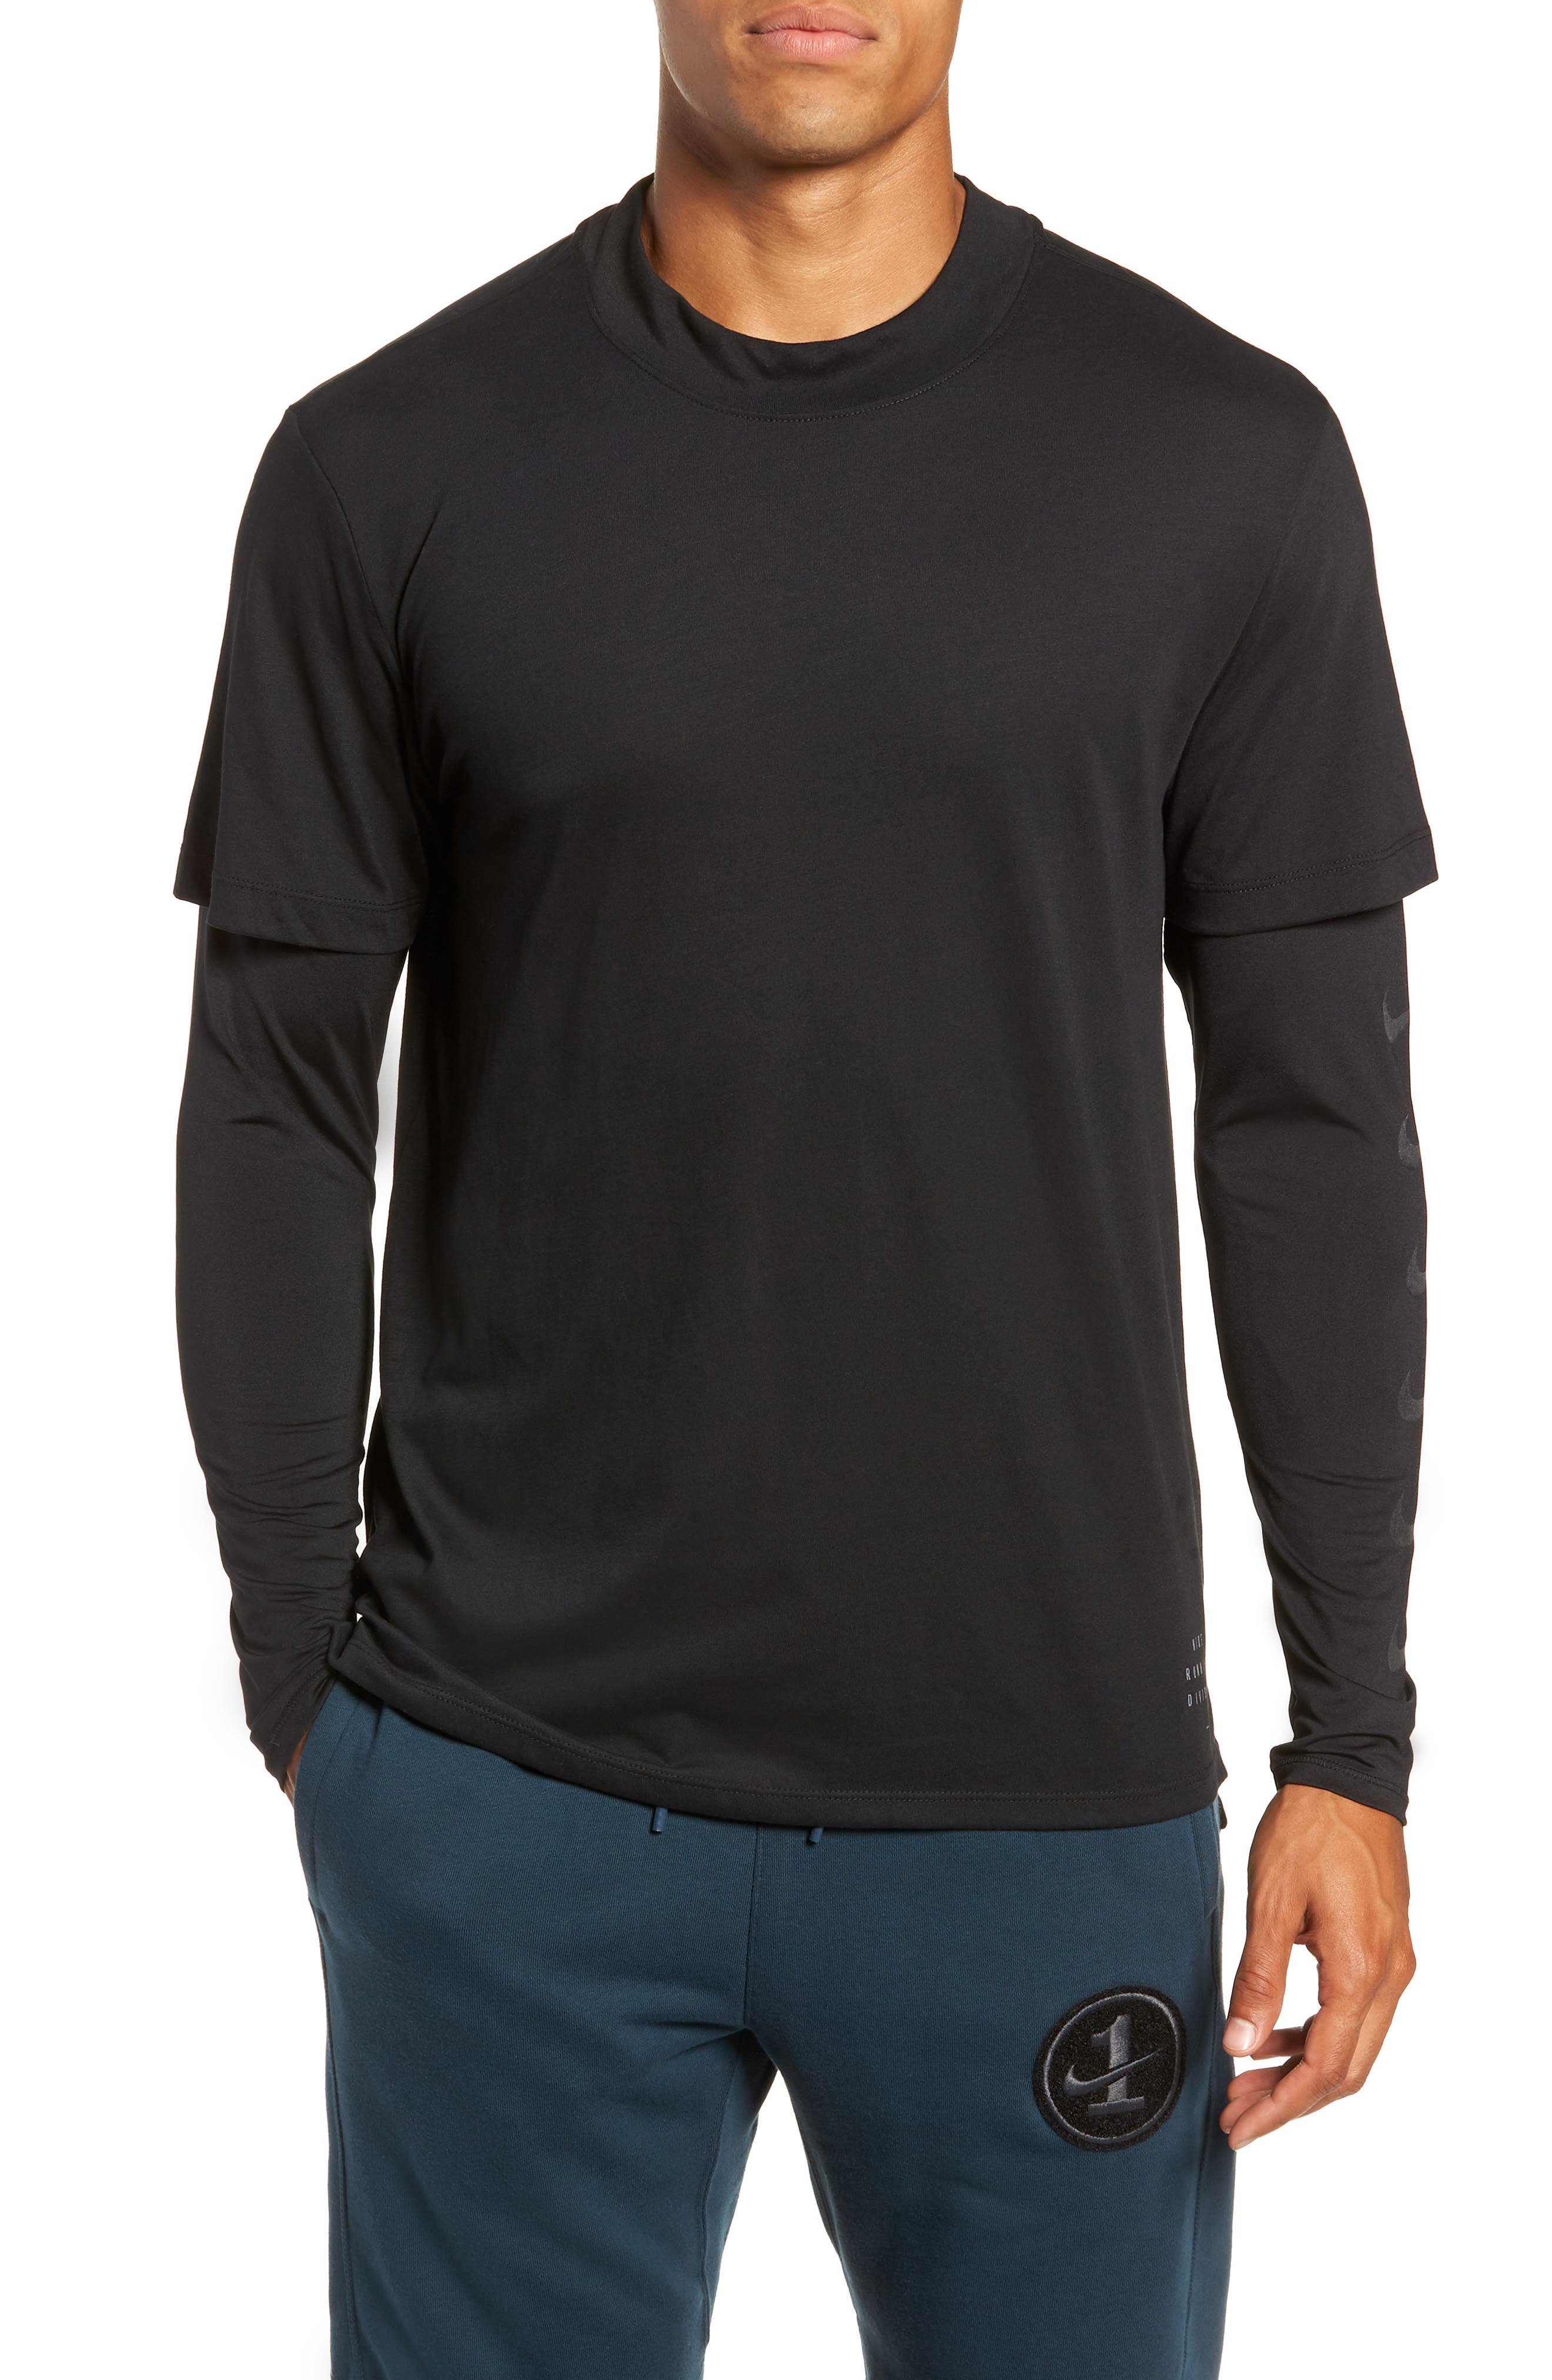 Nike Breathe Rise 365 Layered Long Sleeve T-Shirt Black